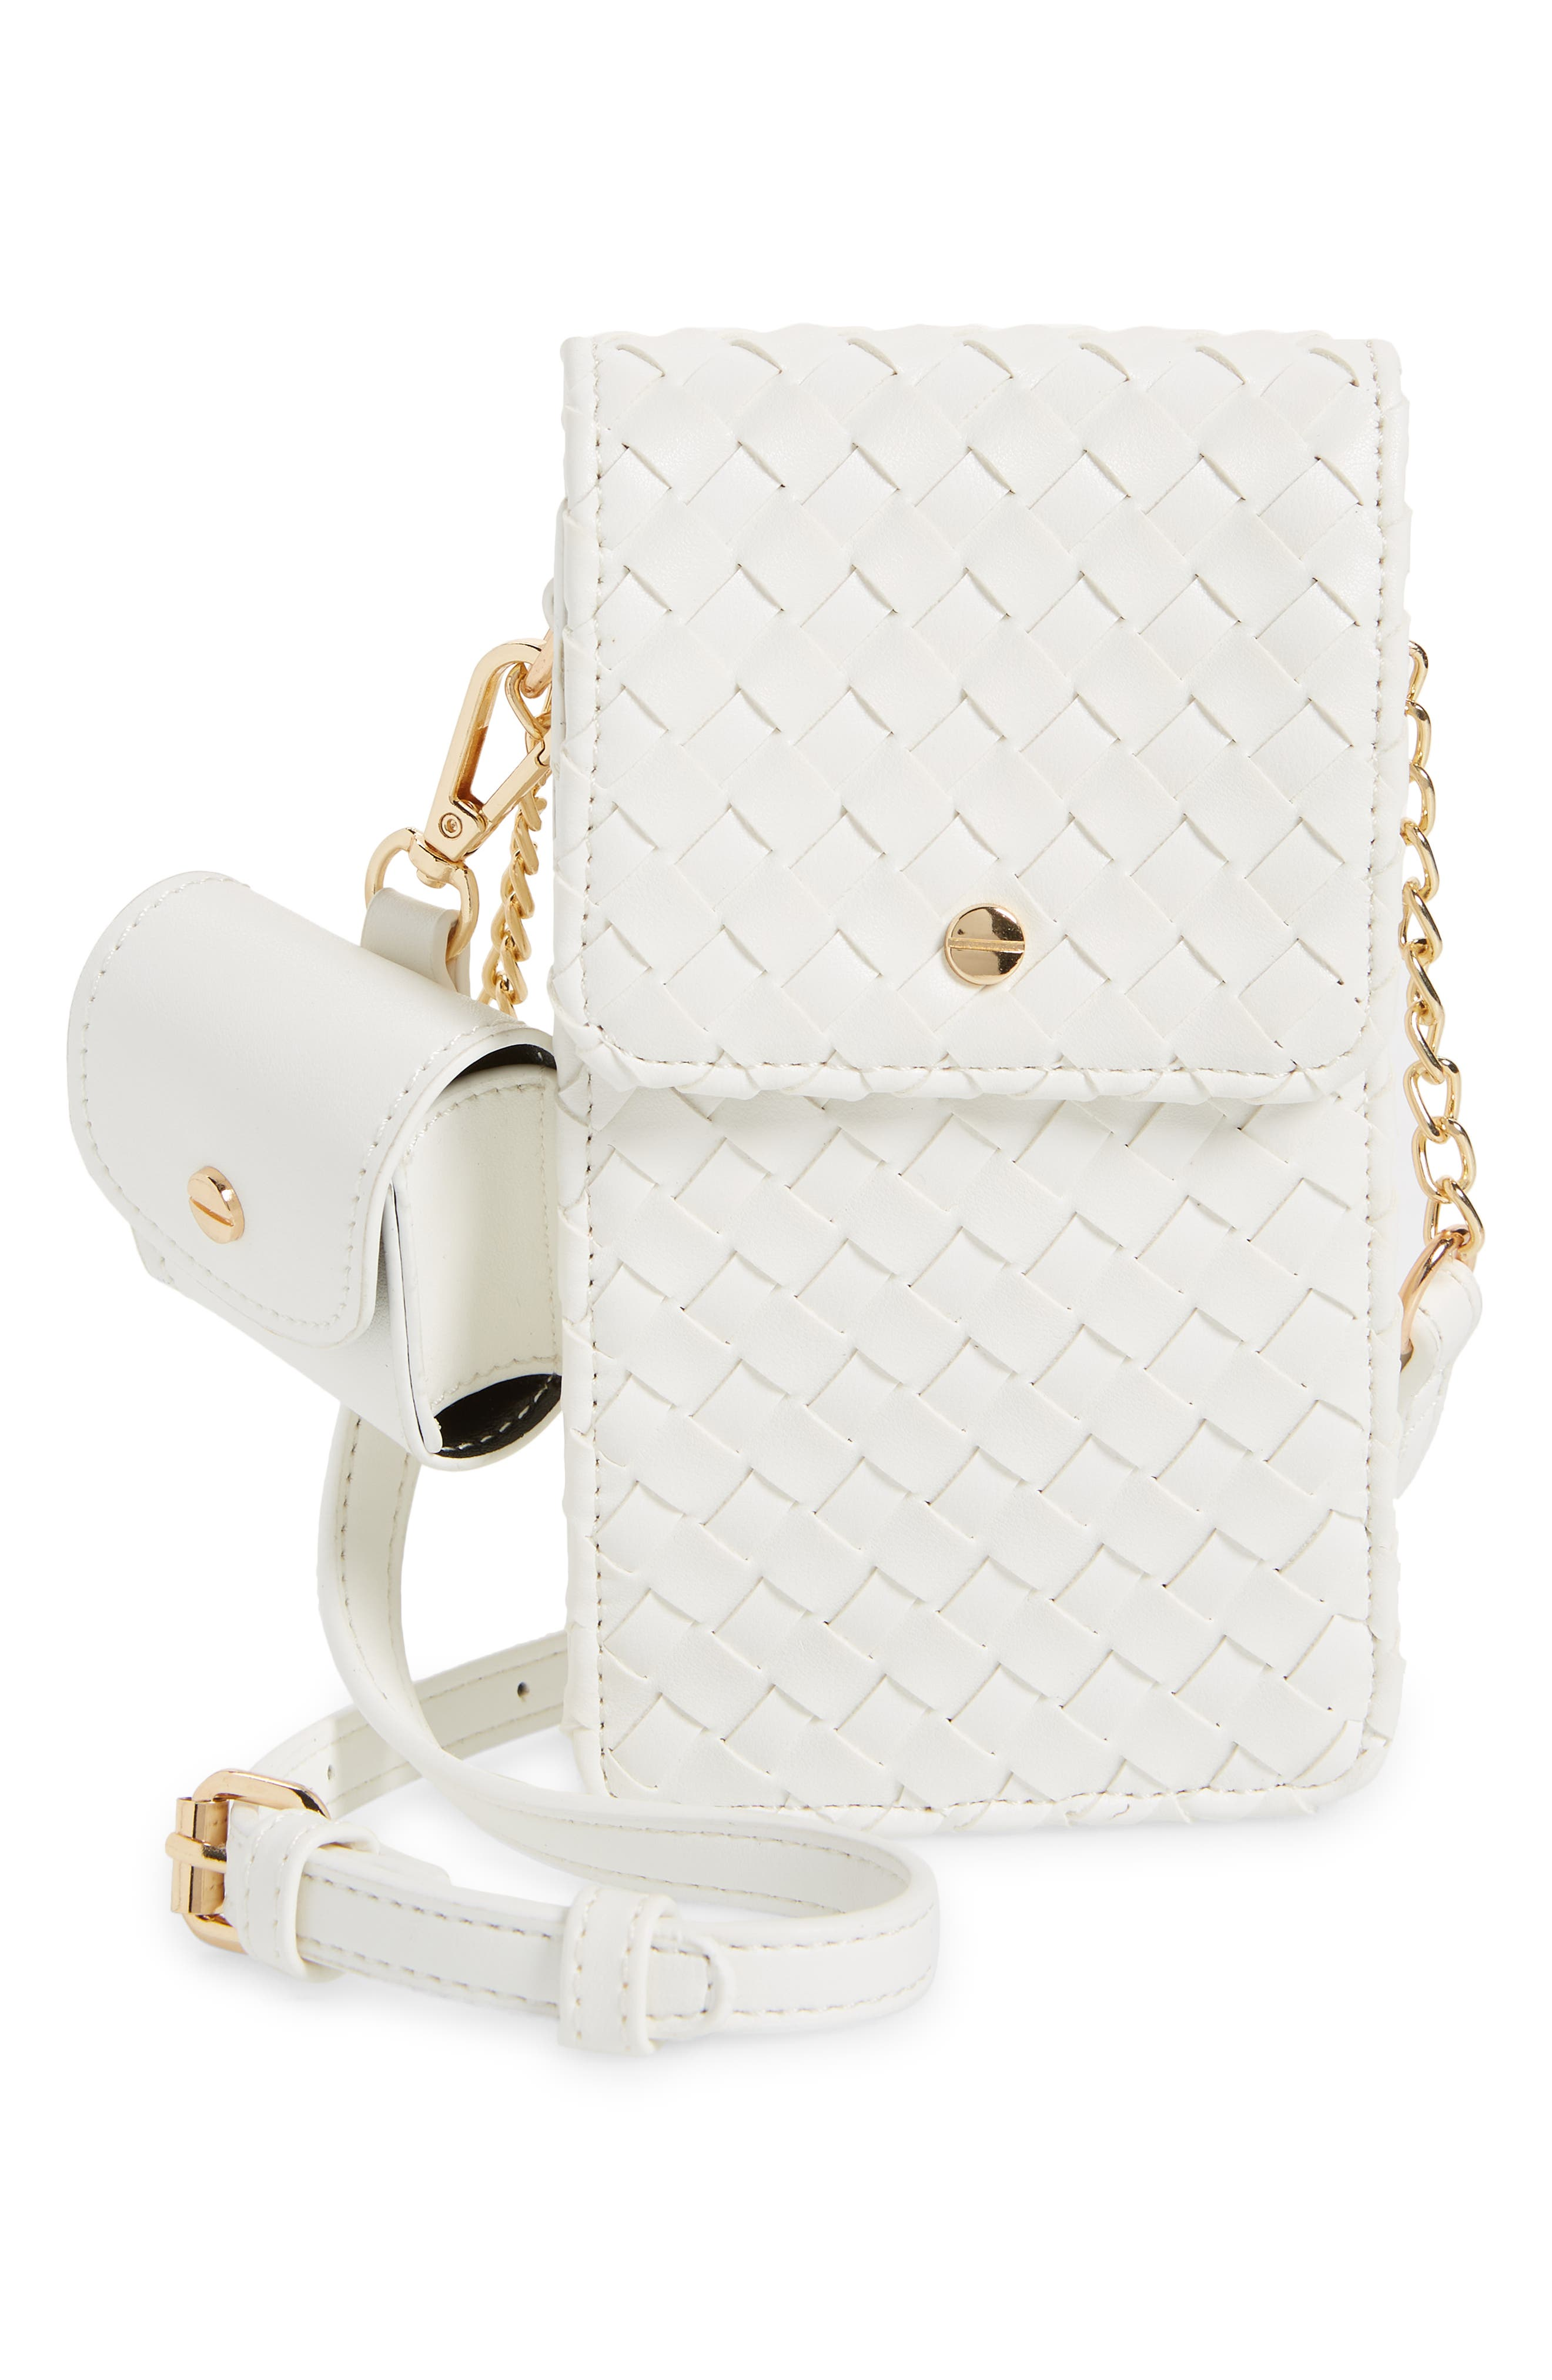 Mali + Lili Woven Vegan Leather Phone Crossbody Bag